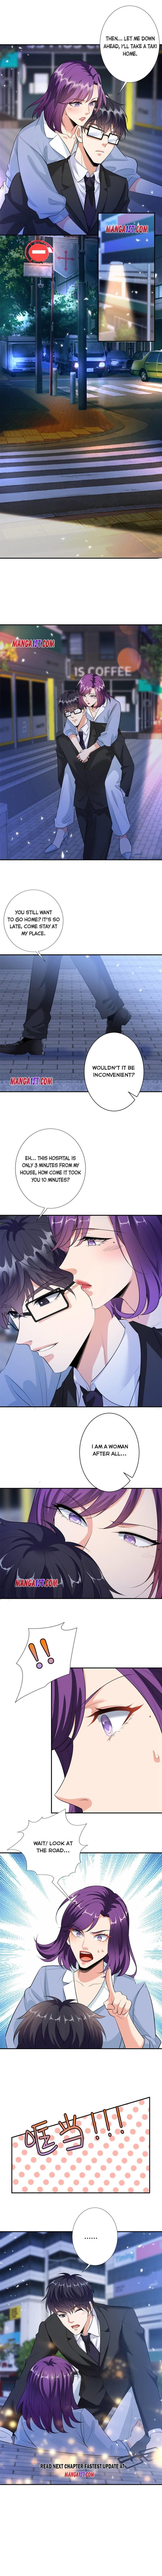 Trial Marriage Husband: Need To Work Hard Chapter 143 page 6 - Mangakakalots.com